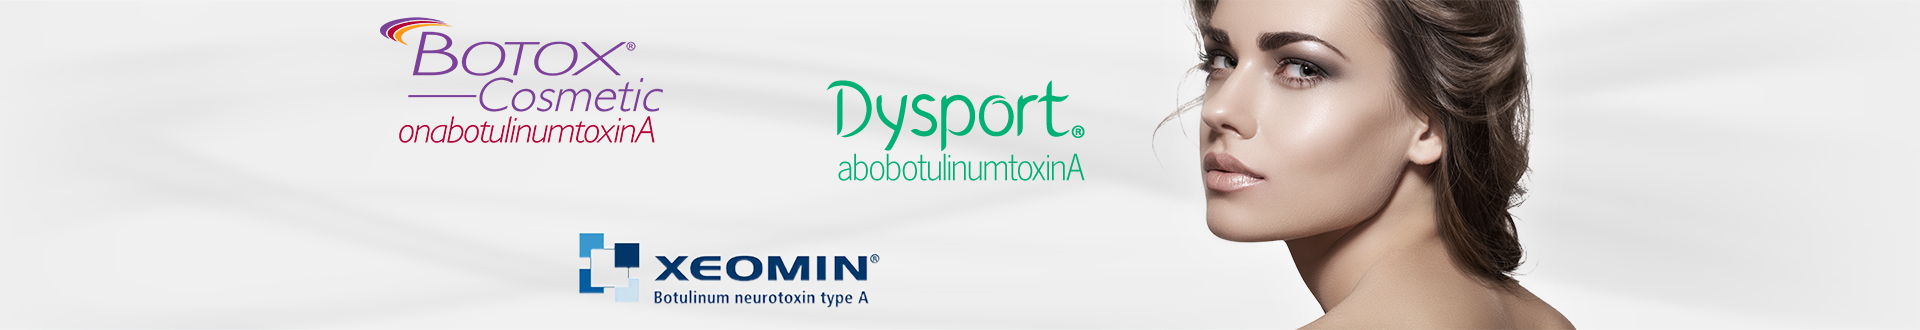 Botox, Xeomin, Dysport